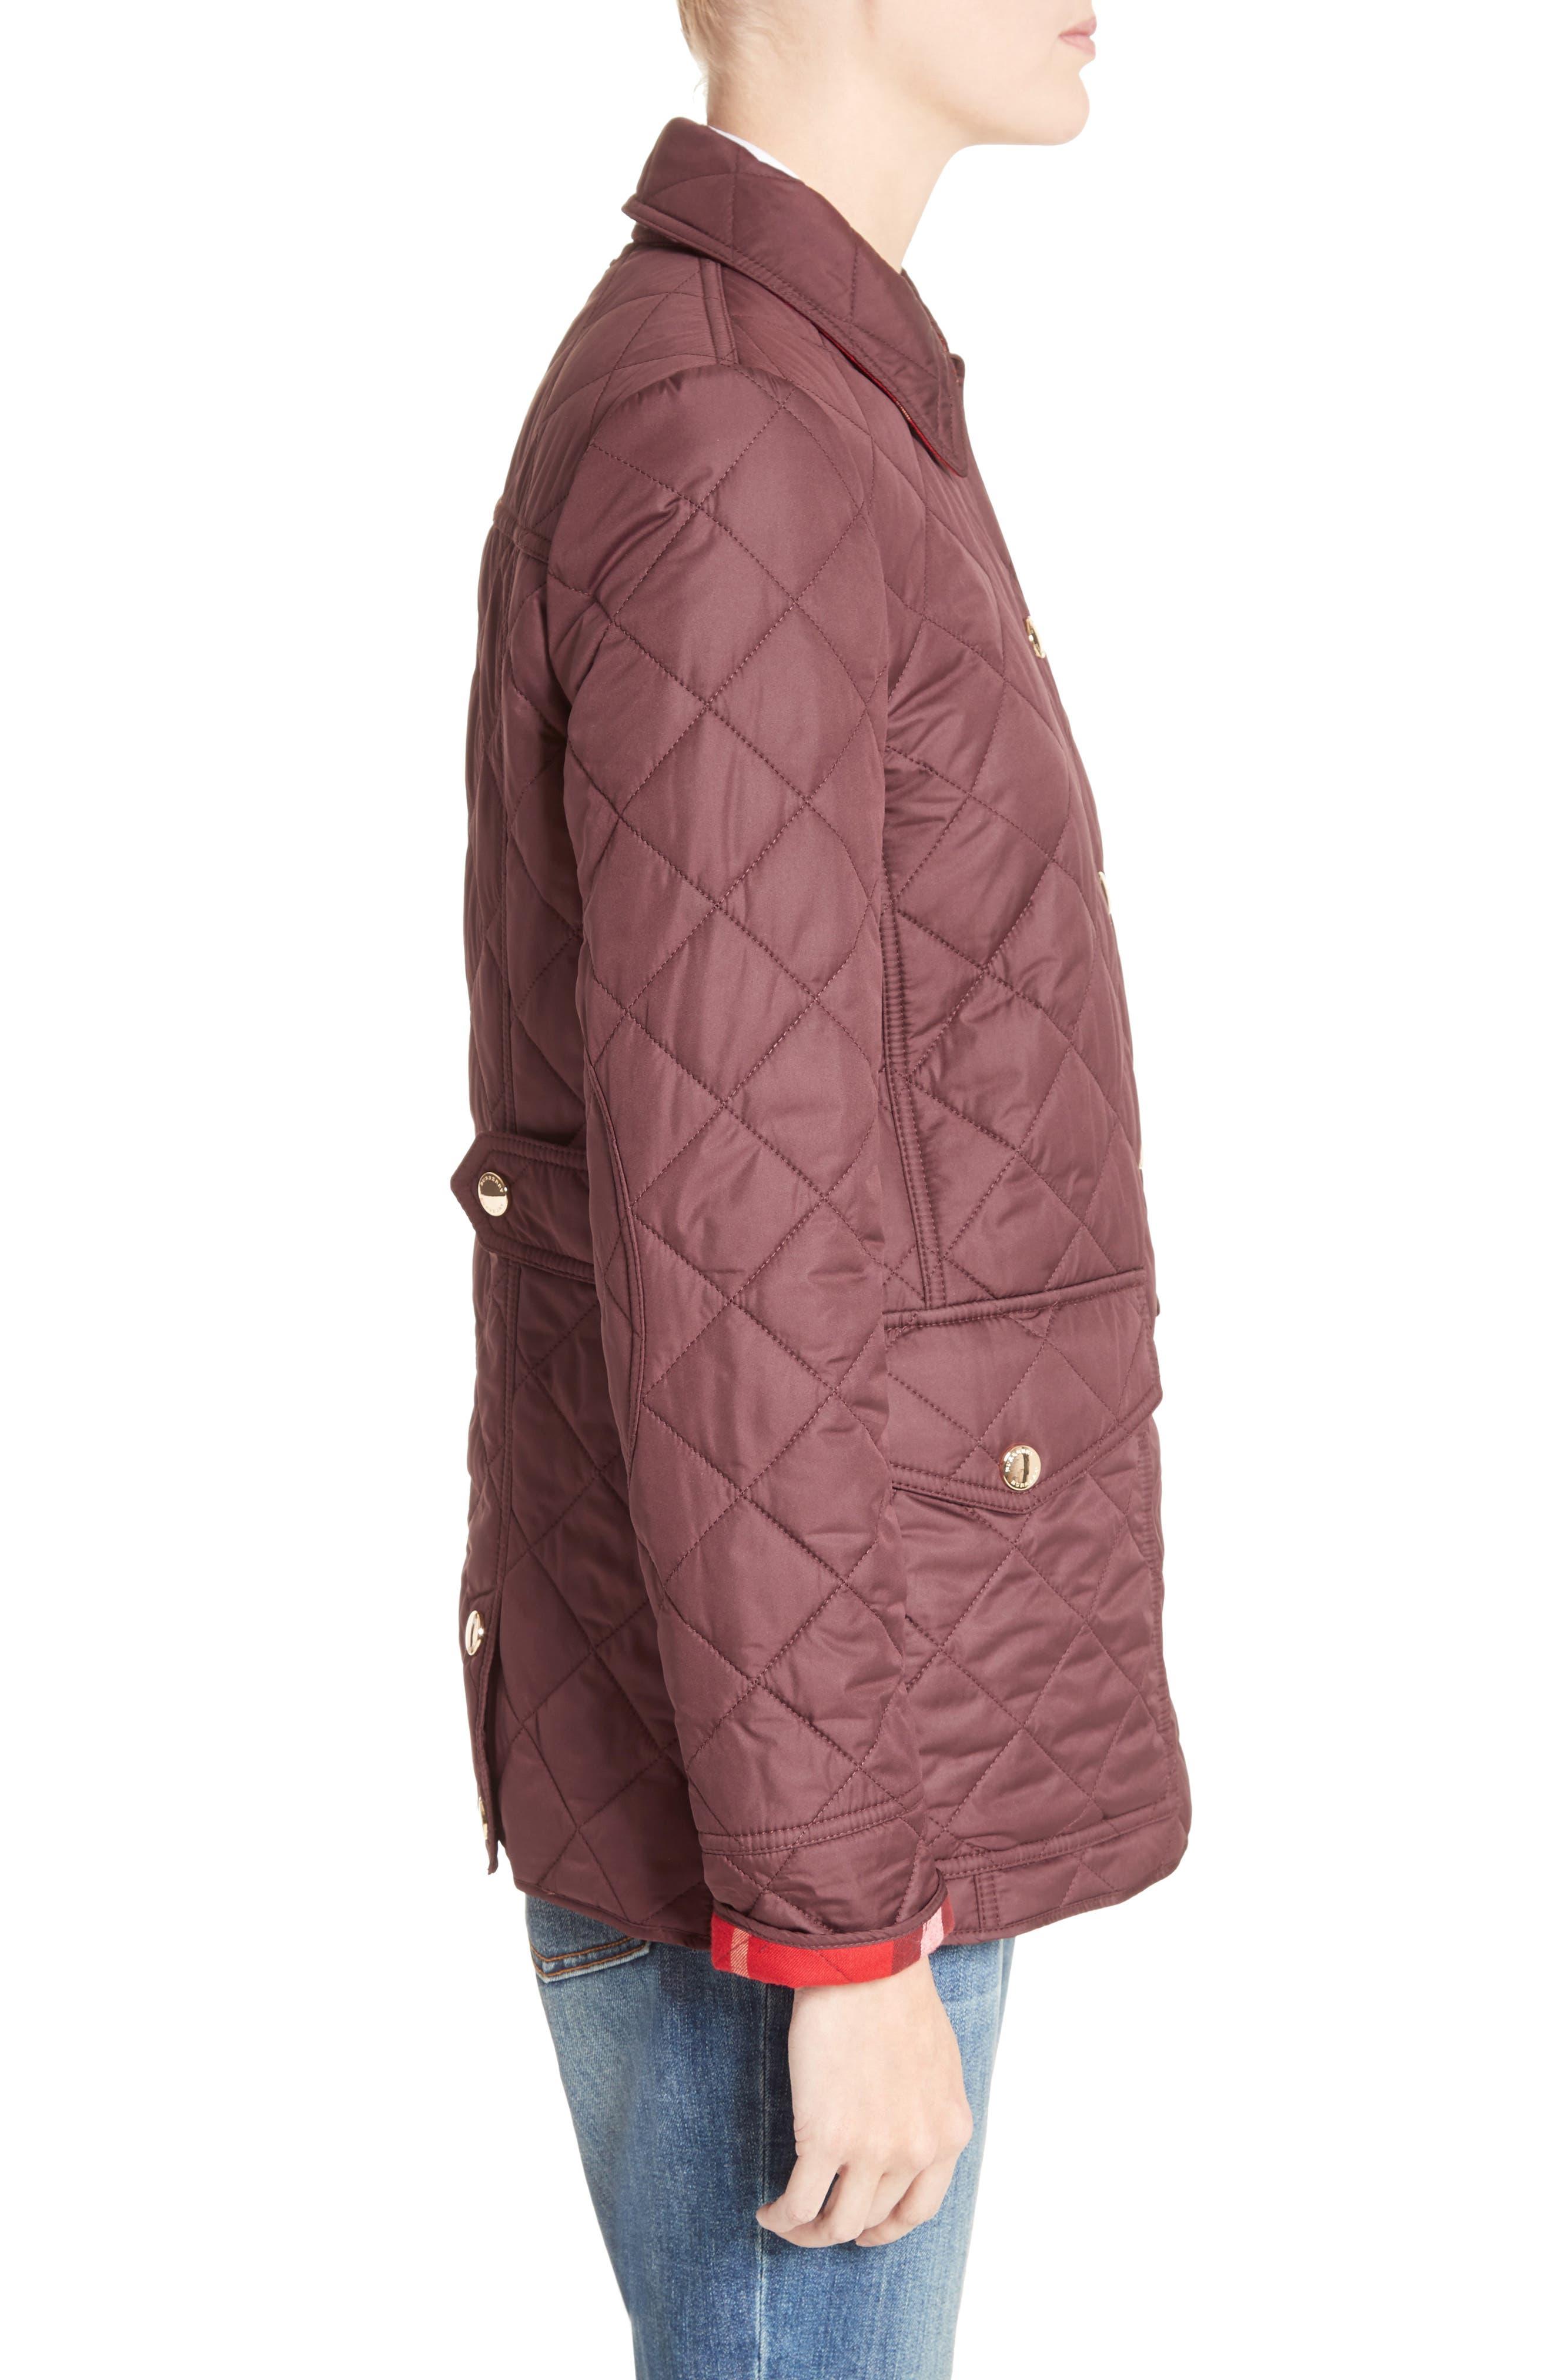 Westbridge Quilted Jacket,                             Alternate thumbnail 4, color,                             Burgundy